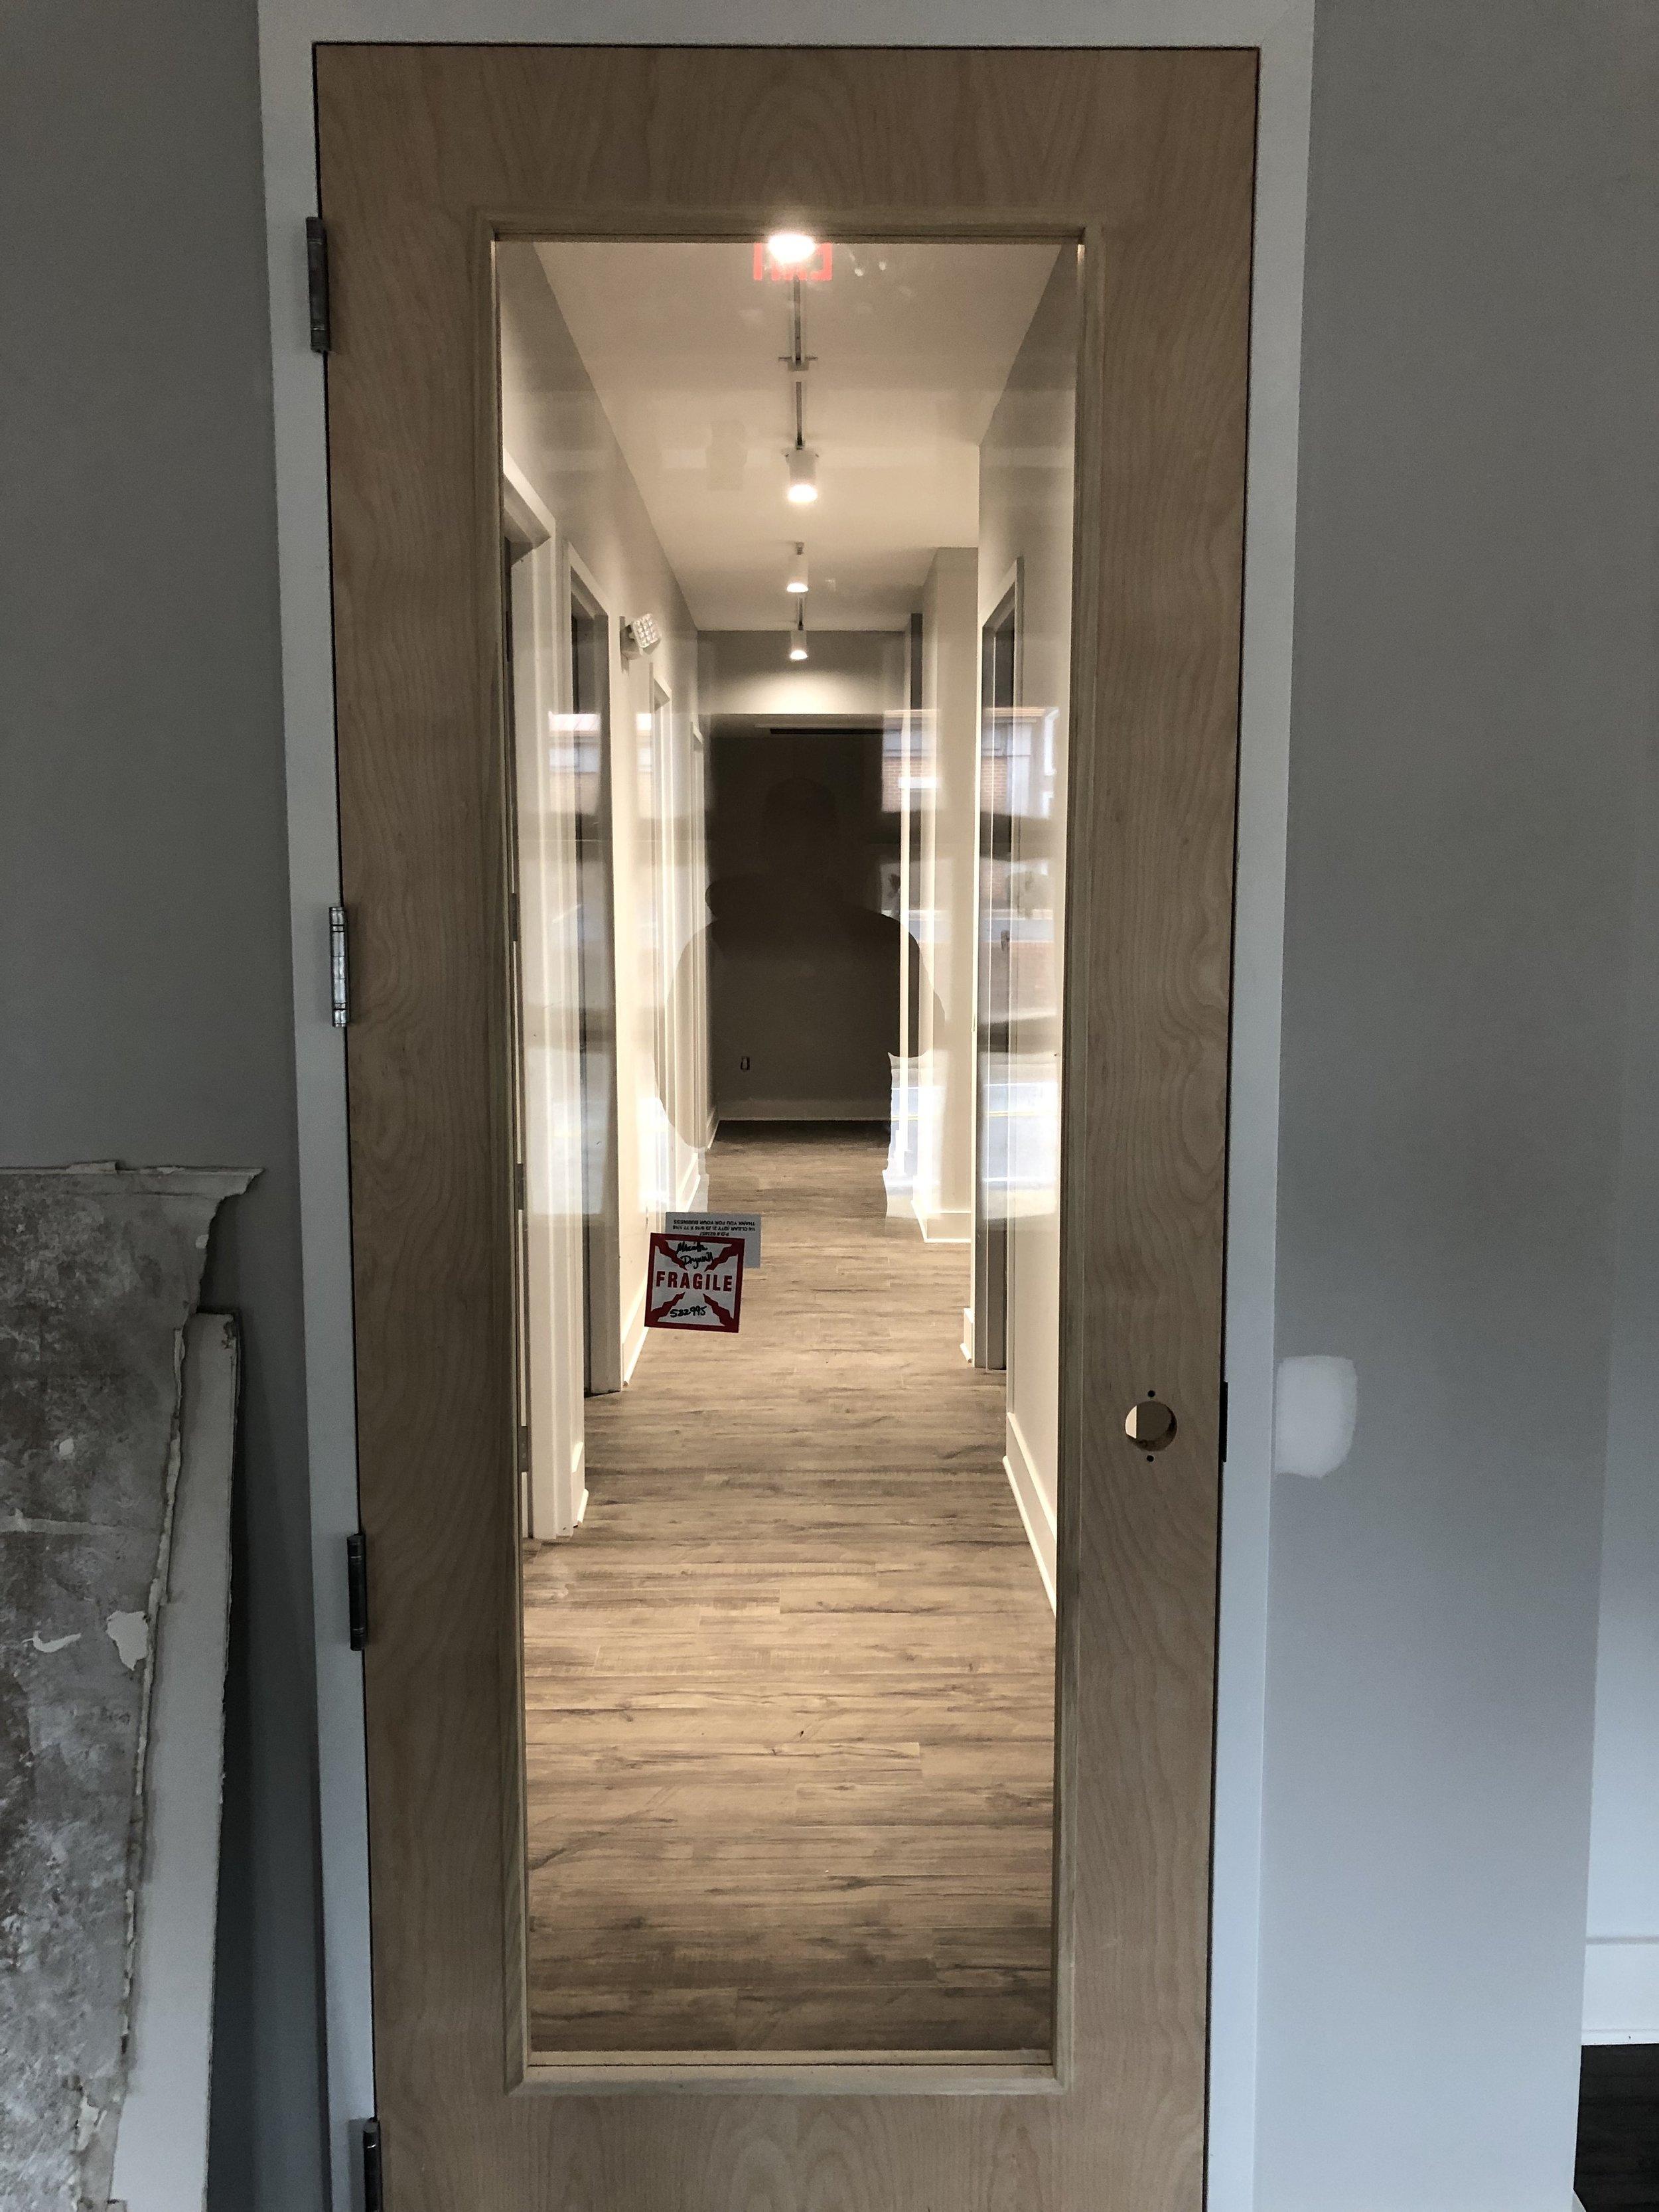 Glass door installation at start of hallways.